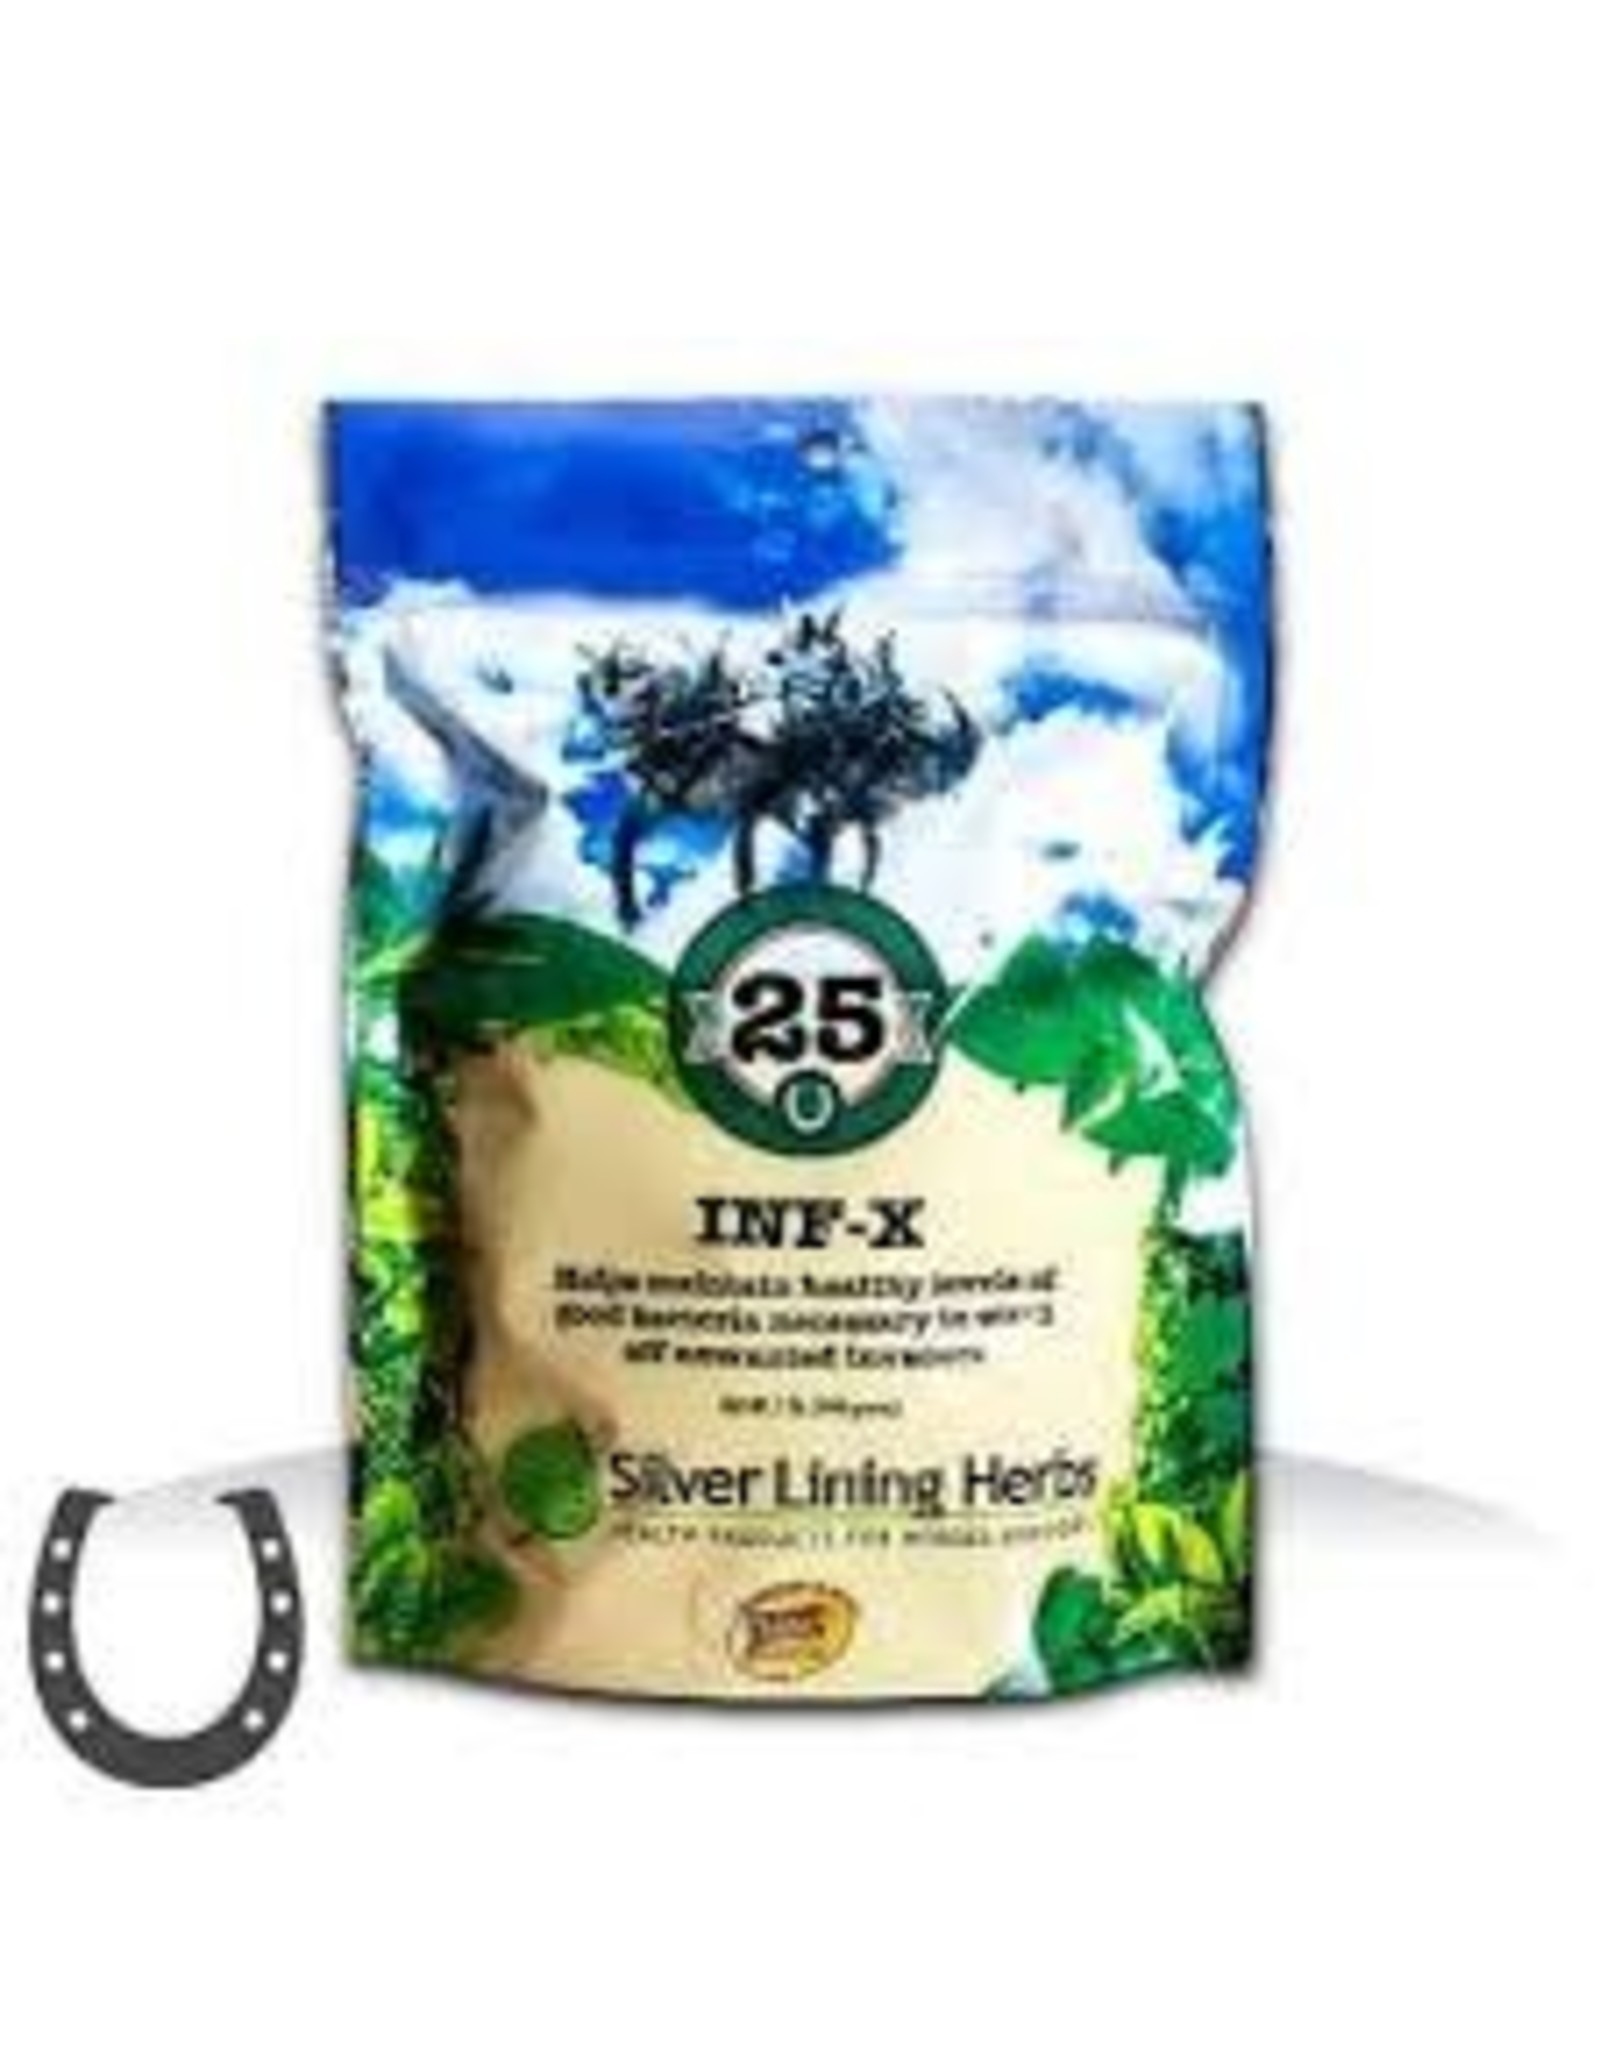 #25 Mini Bag INF-X EK25- Special order